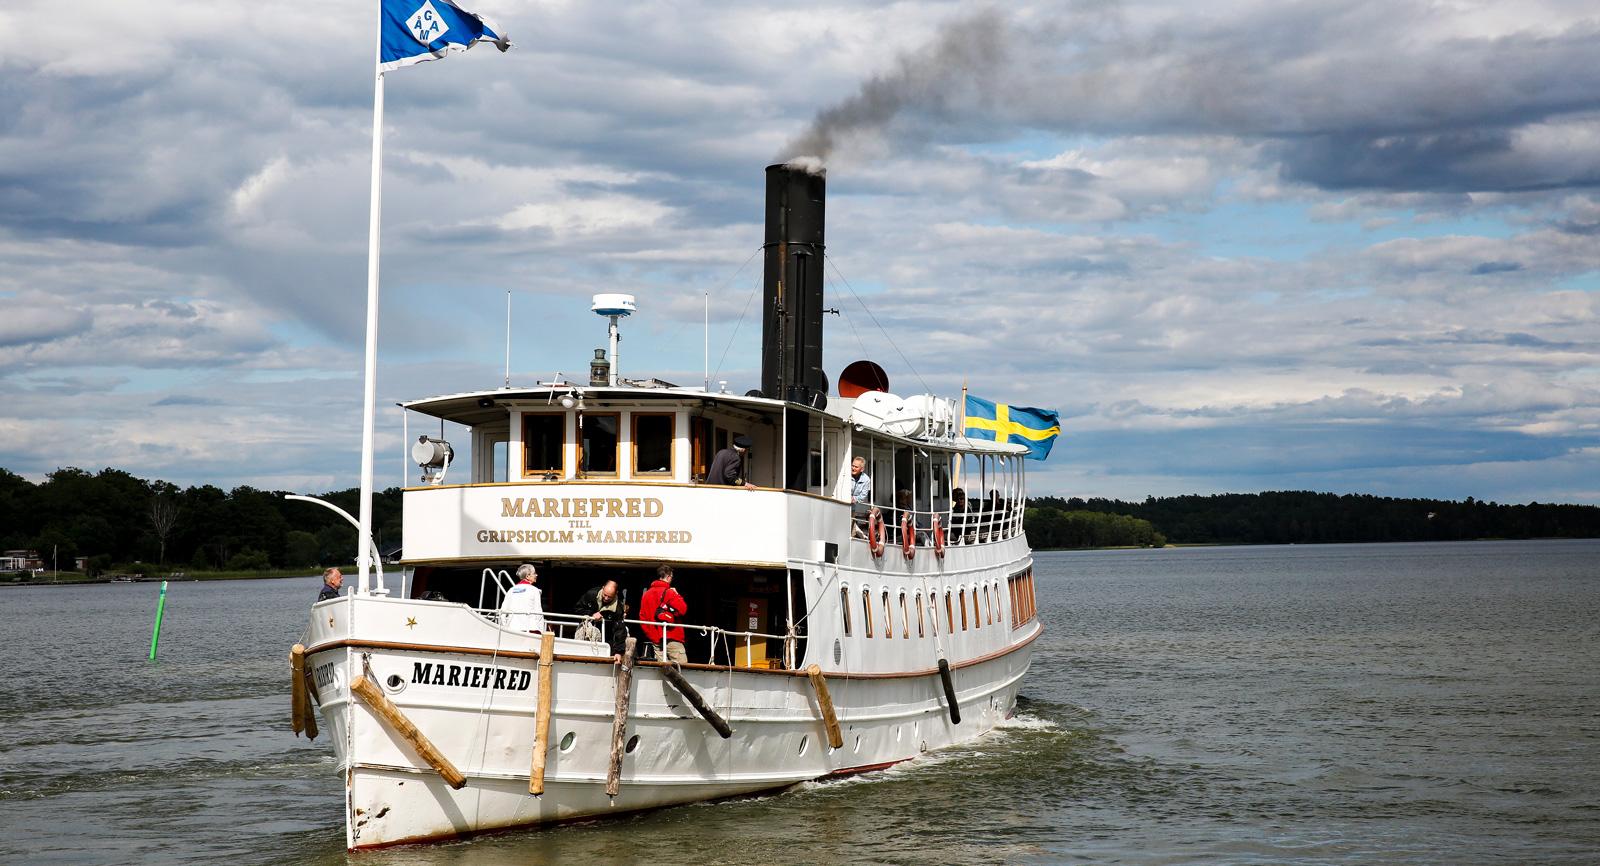 S/S Mariefred byggdes 1903 på södra varvet i Stockholm.